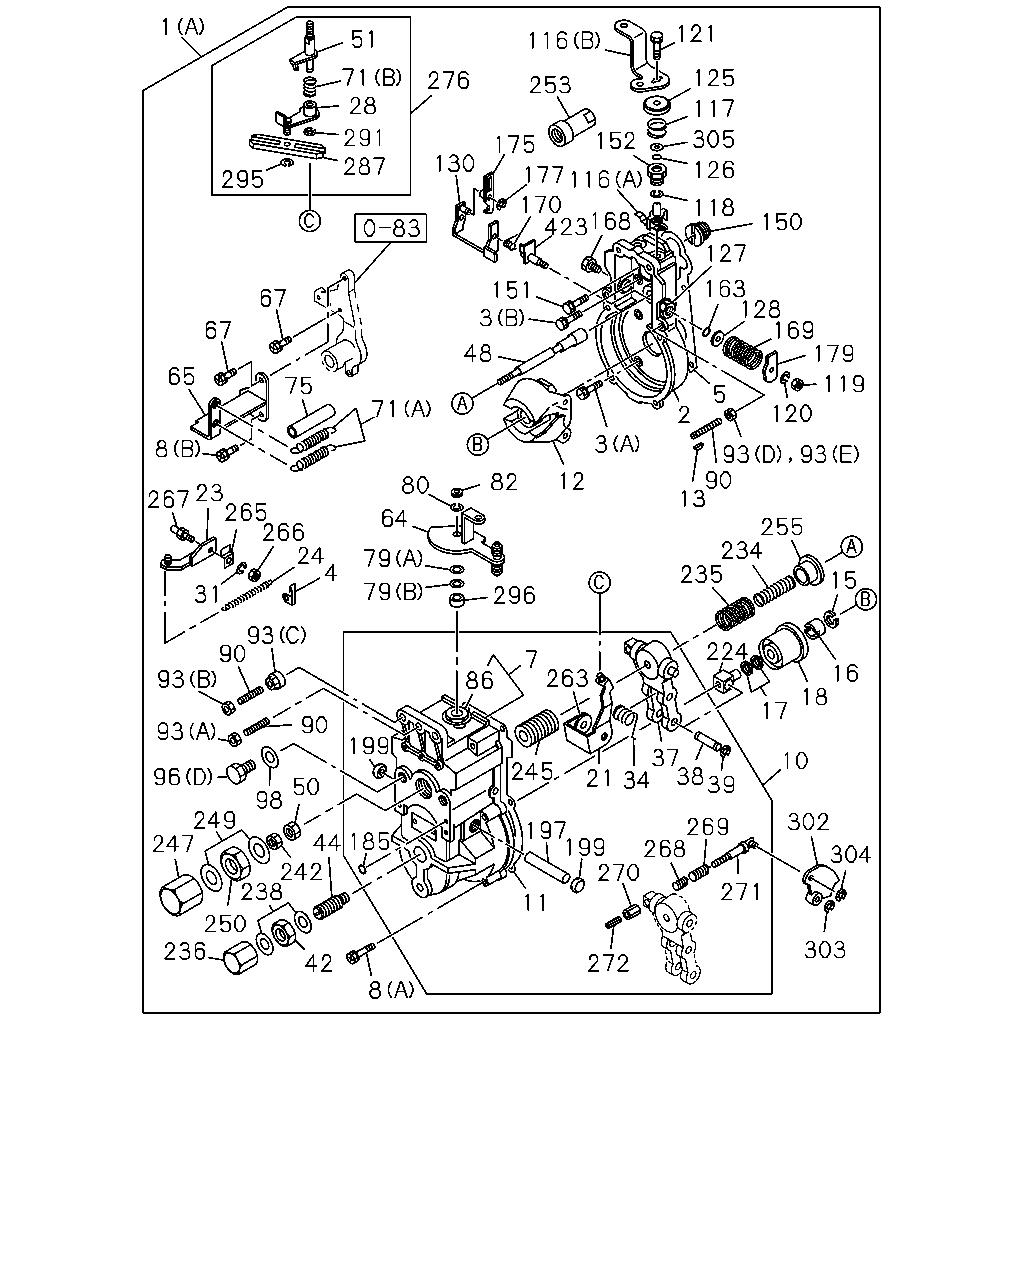 Mt 10650 Mt111112 91 04 0 Engine Emission F 117 Diagram Parts